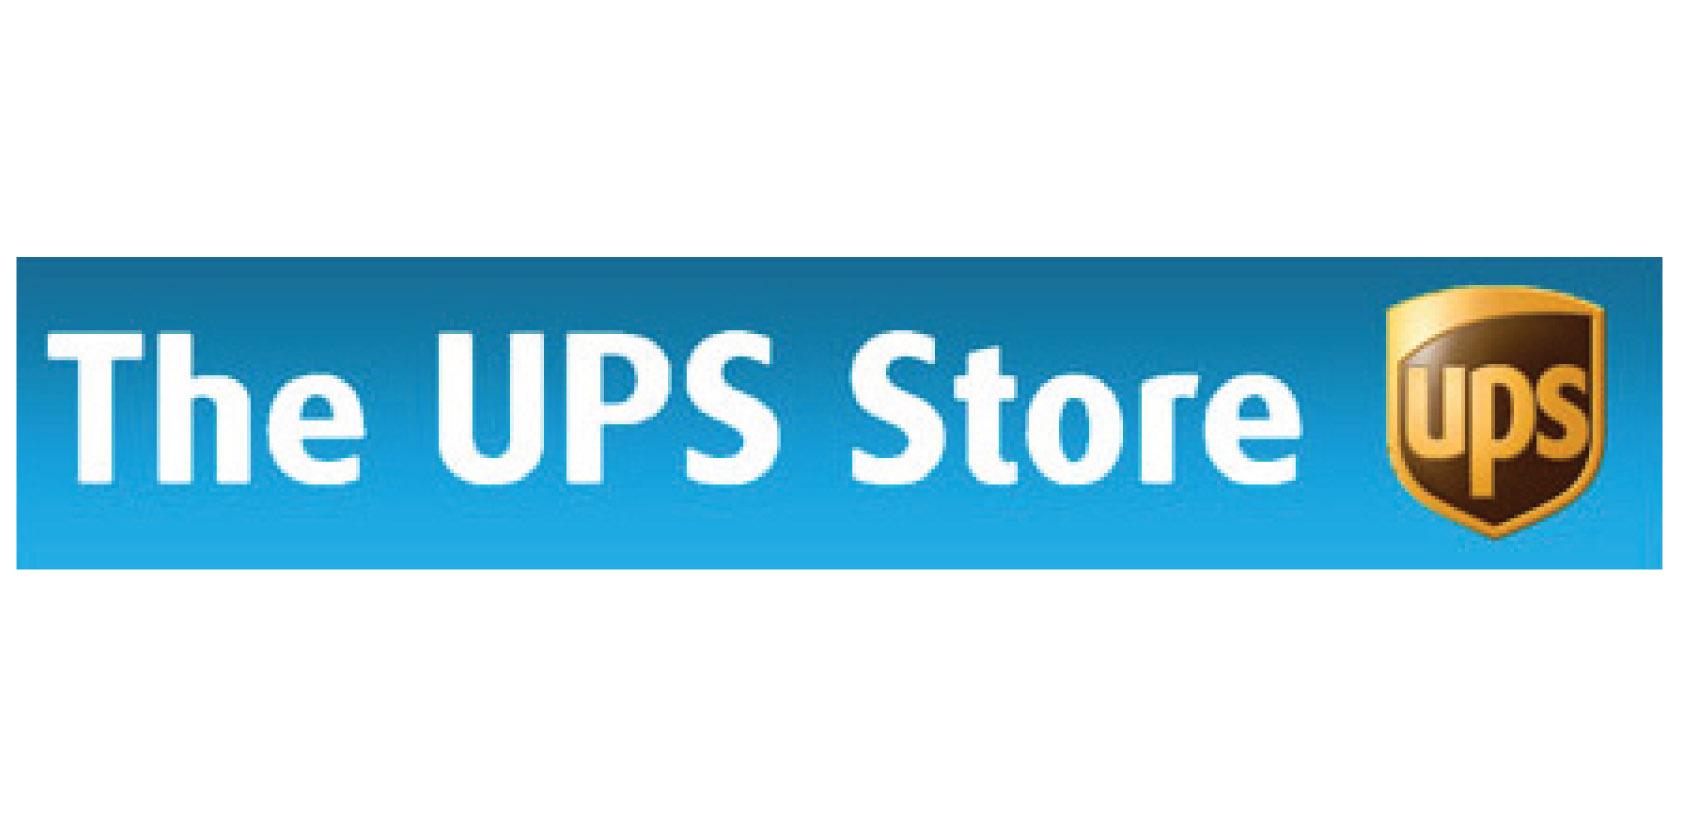 The ups store Logos.